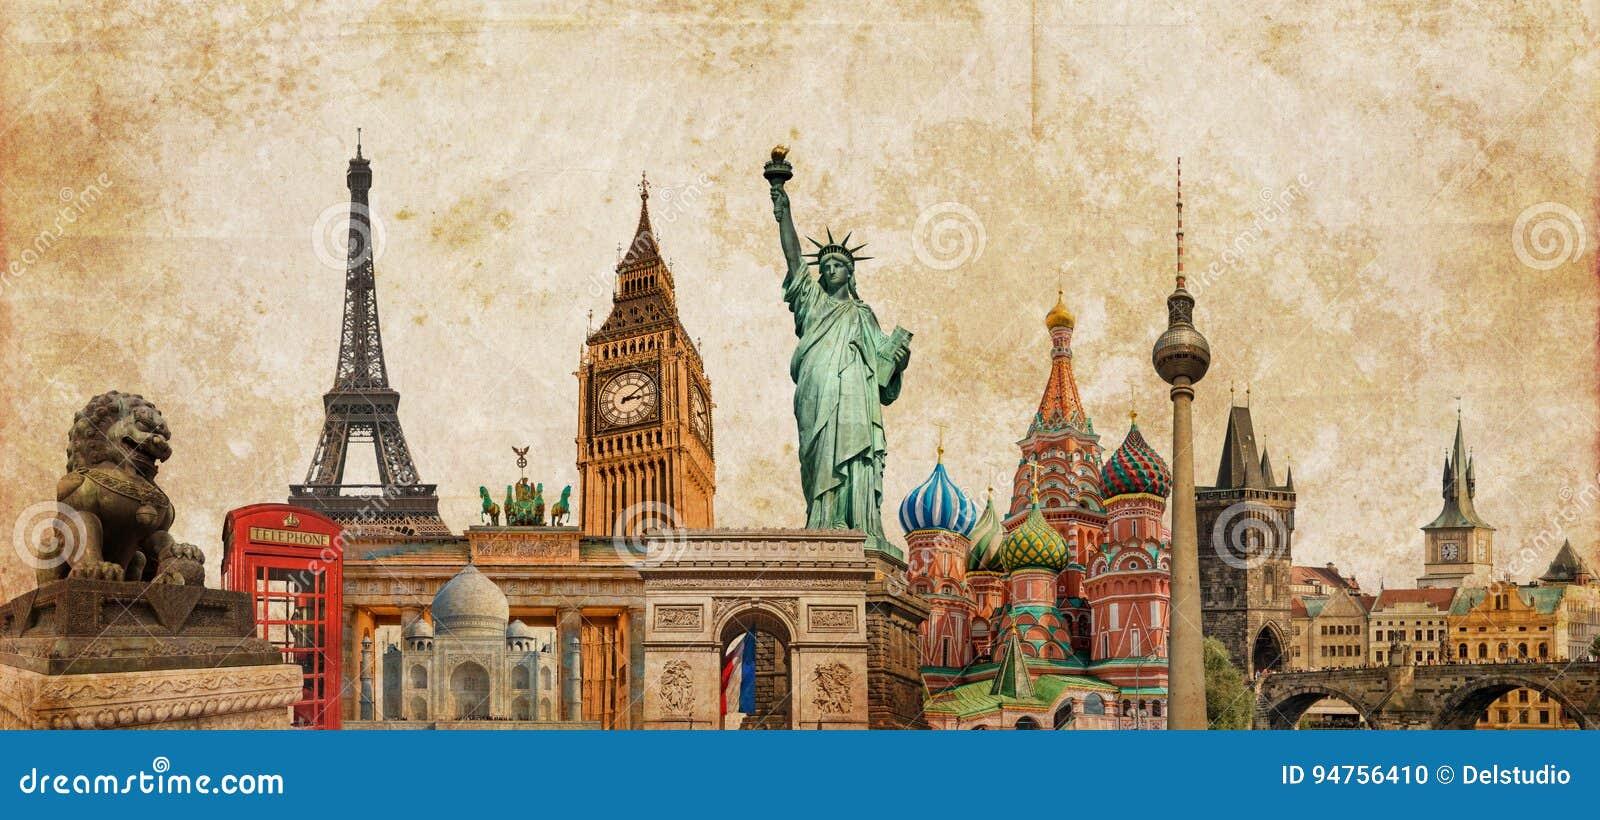 World landmarks photo collage on vintage tes sepia textured background, travel tourism and study around the world concept, vintag